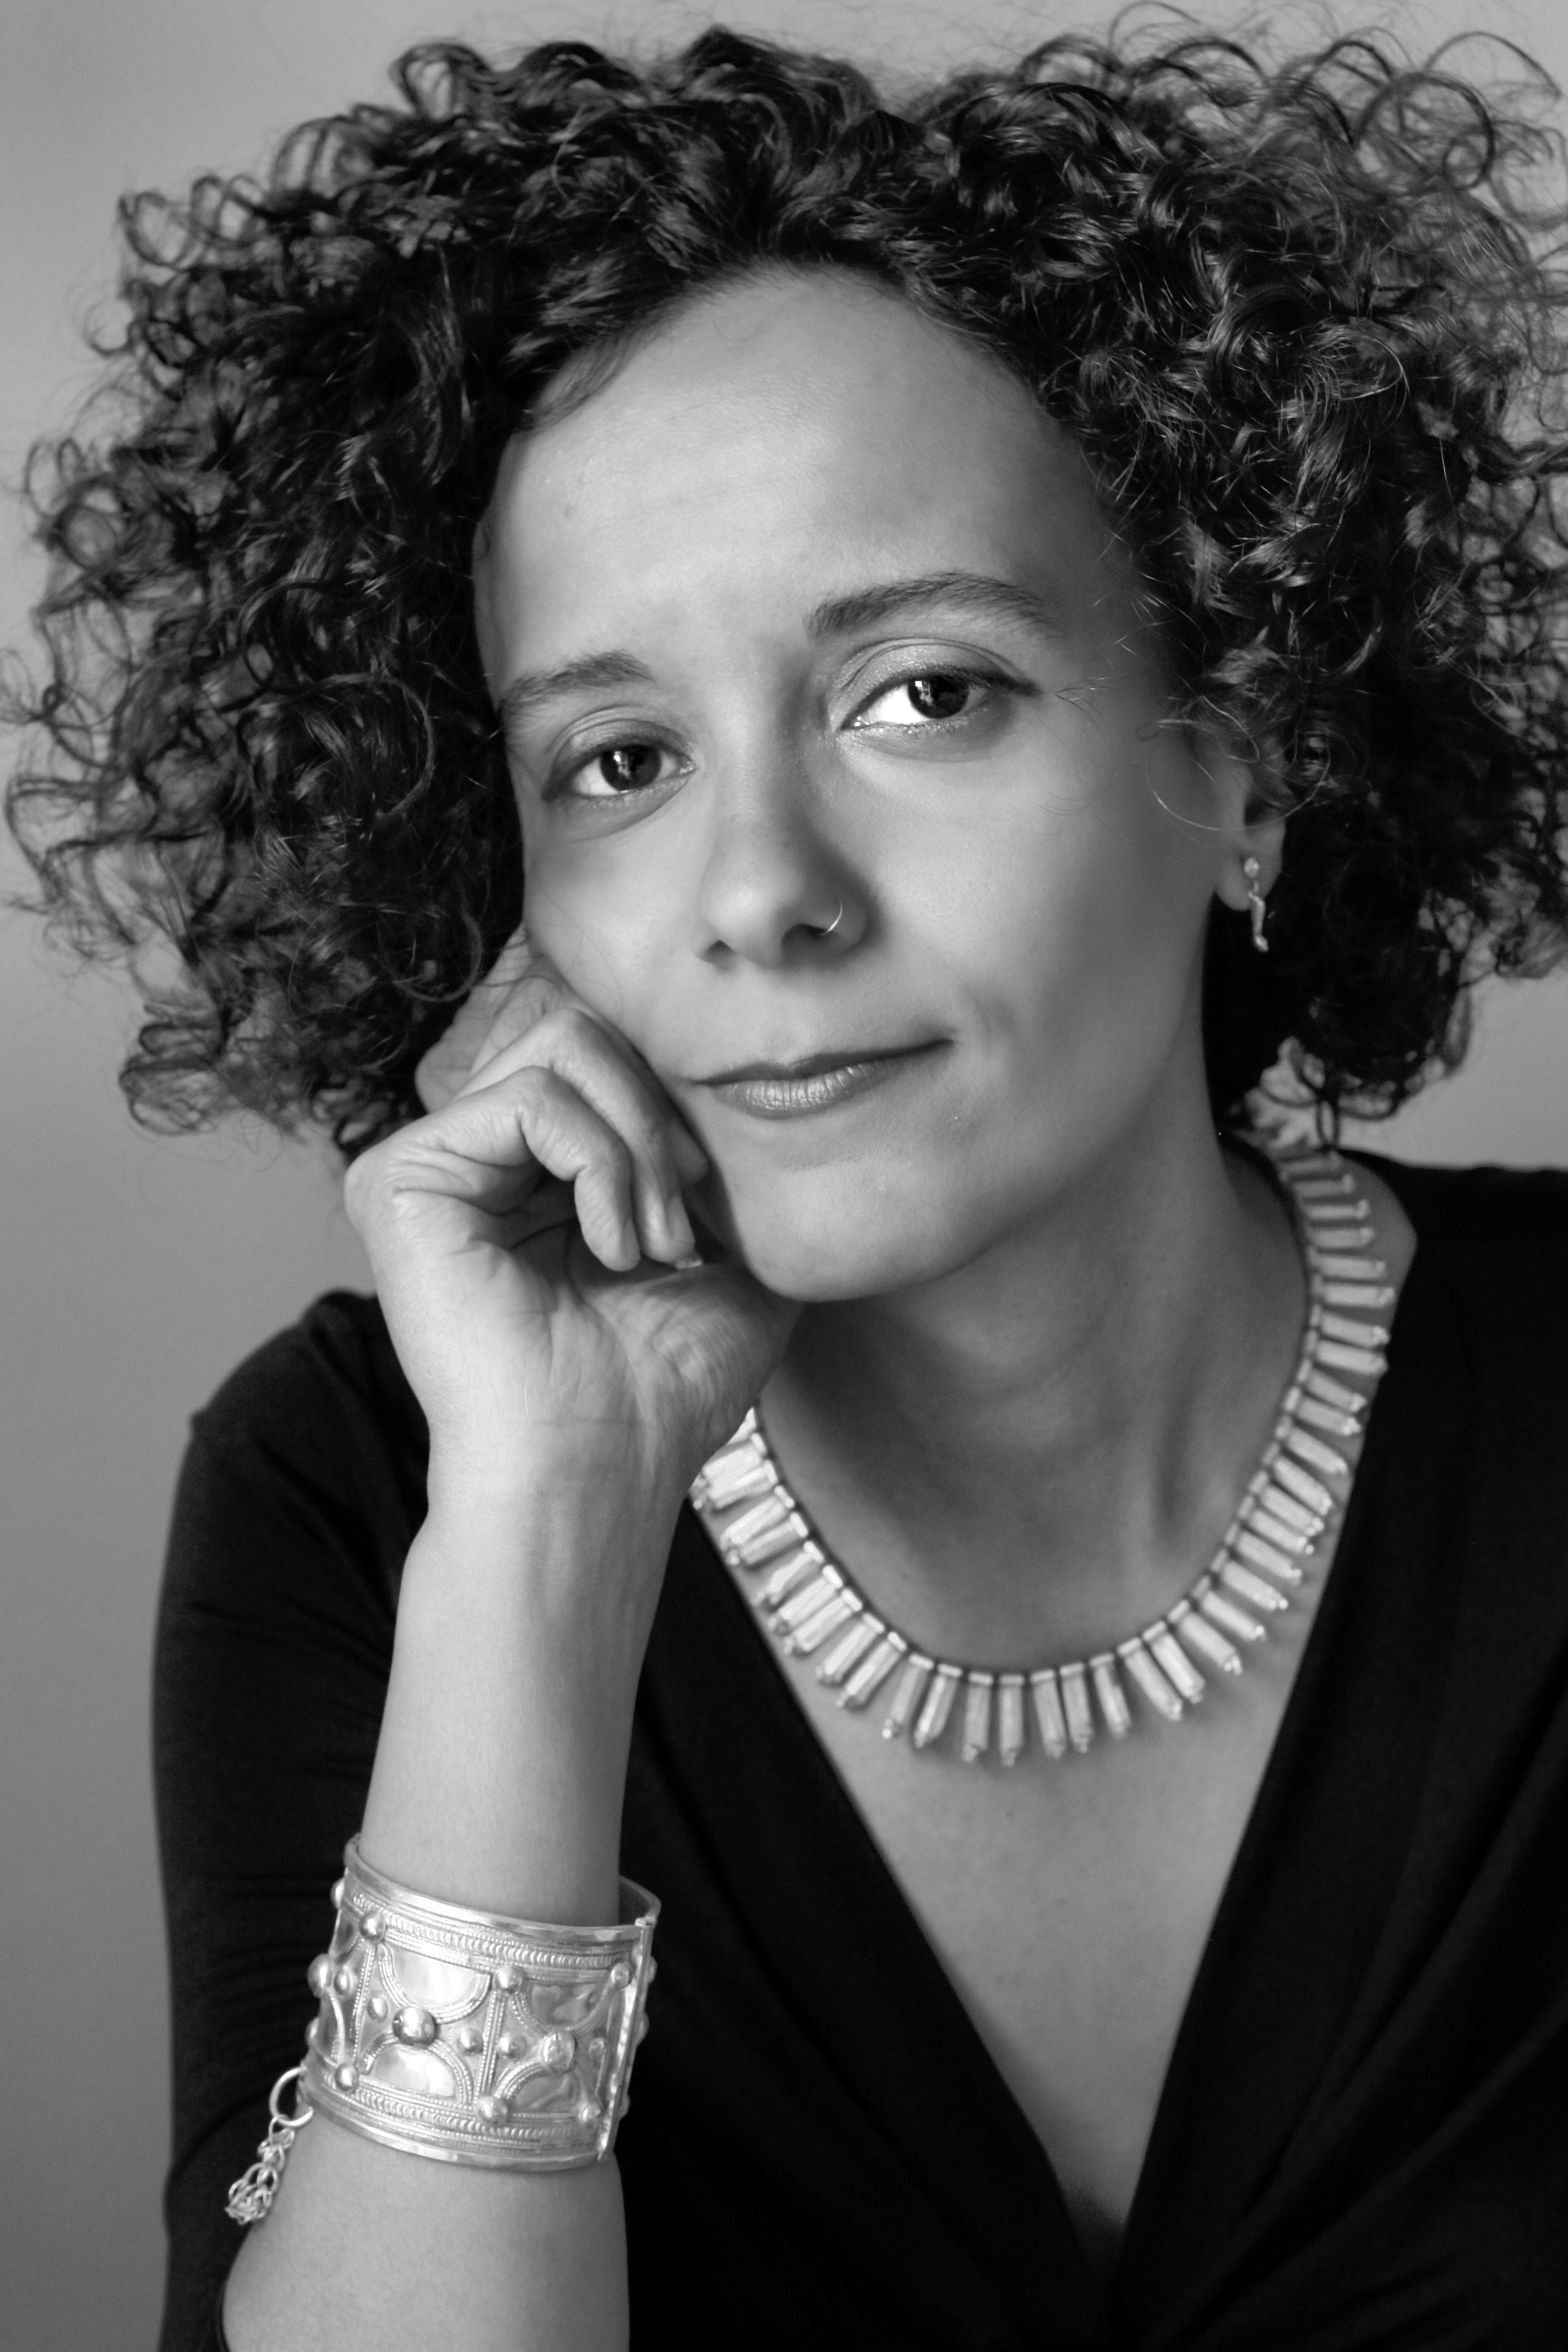 Sonia Tedla Chebreab